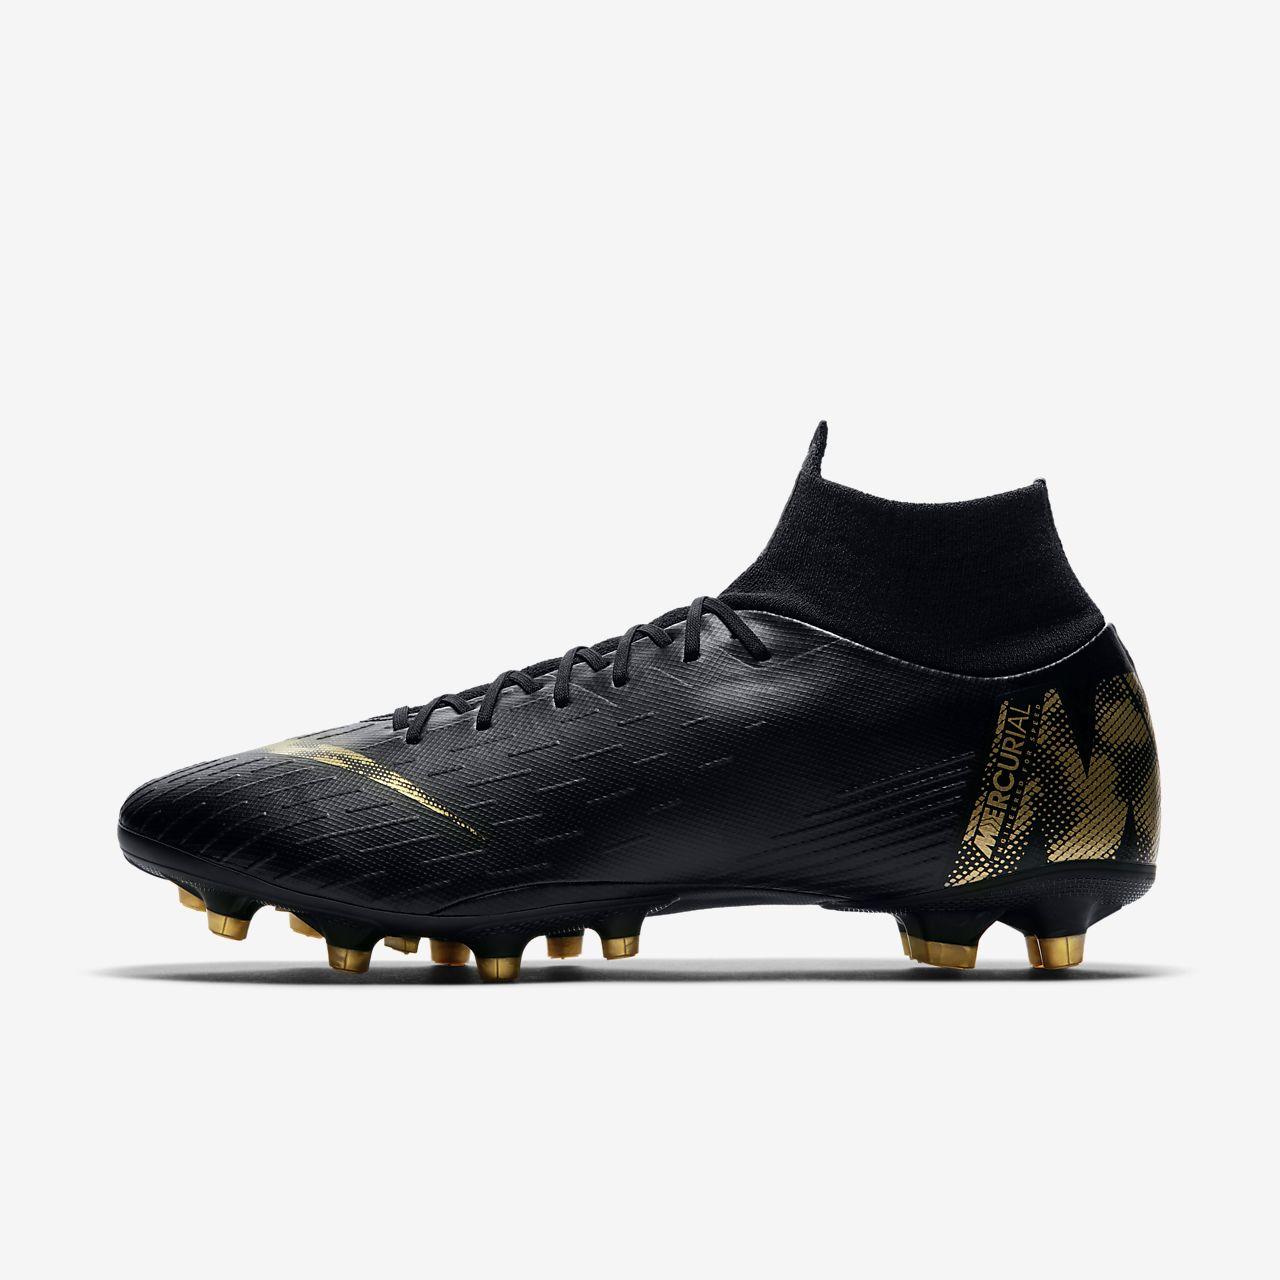 Calzado de fútbol para pasto artificial Nike Mercurial Superfly VI Pro AG-PRO